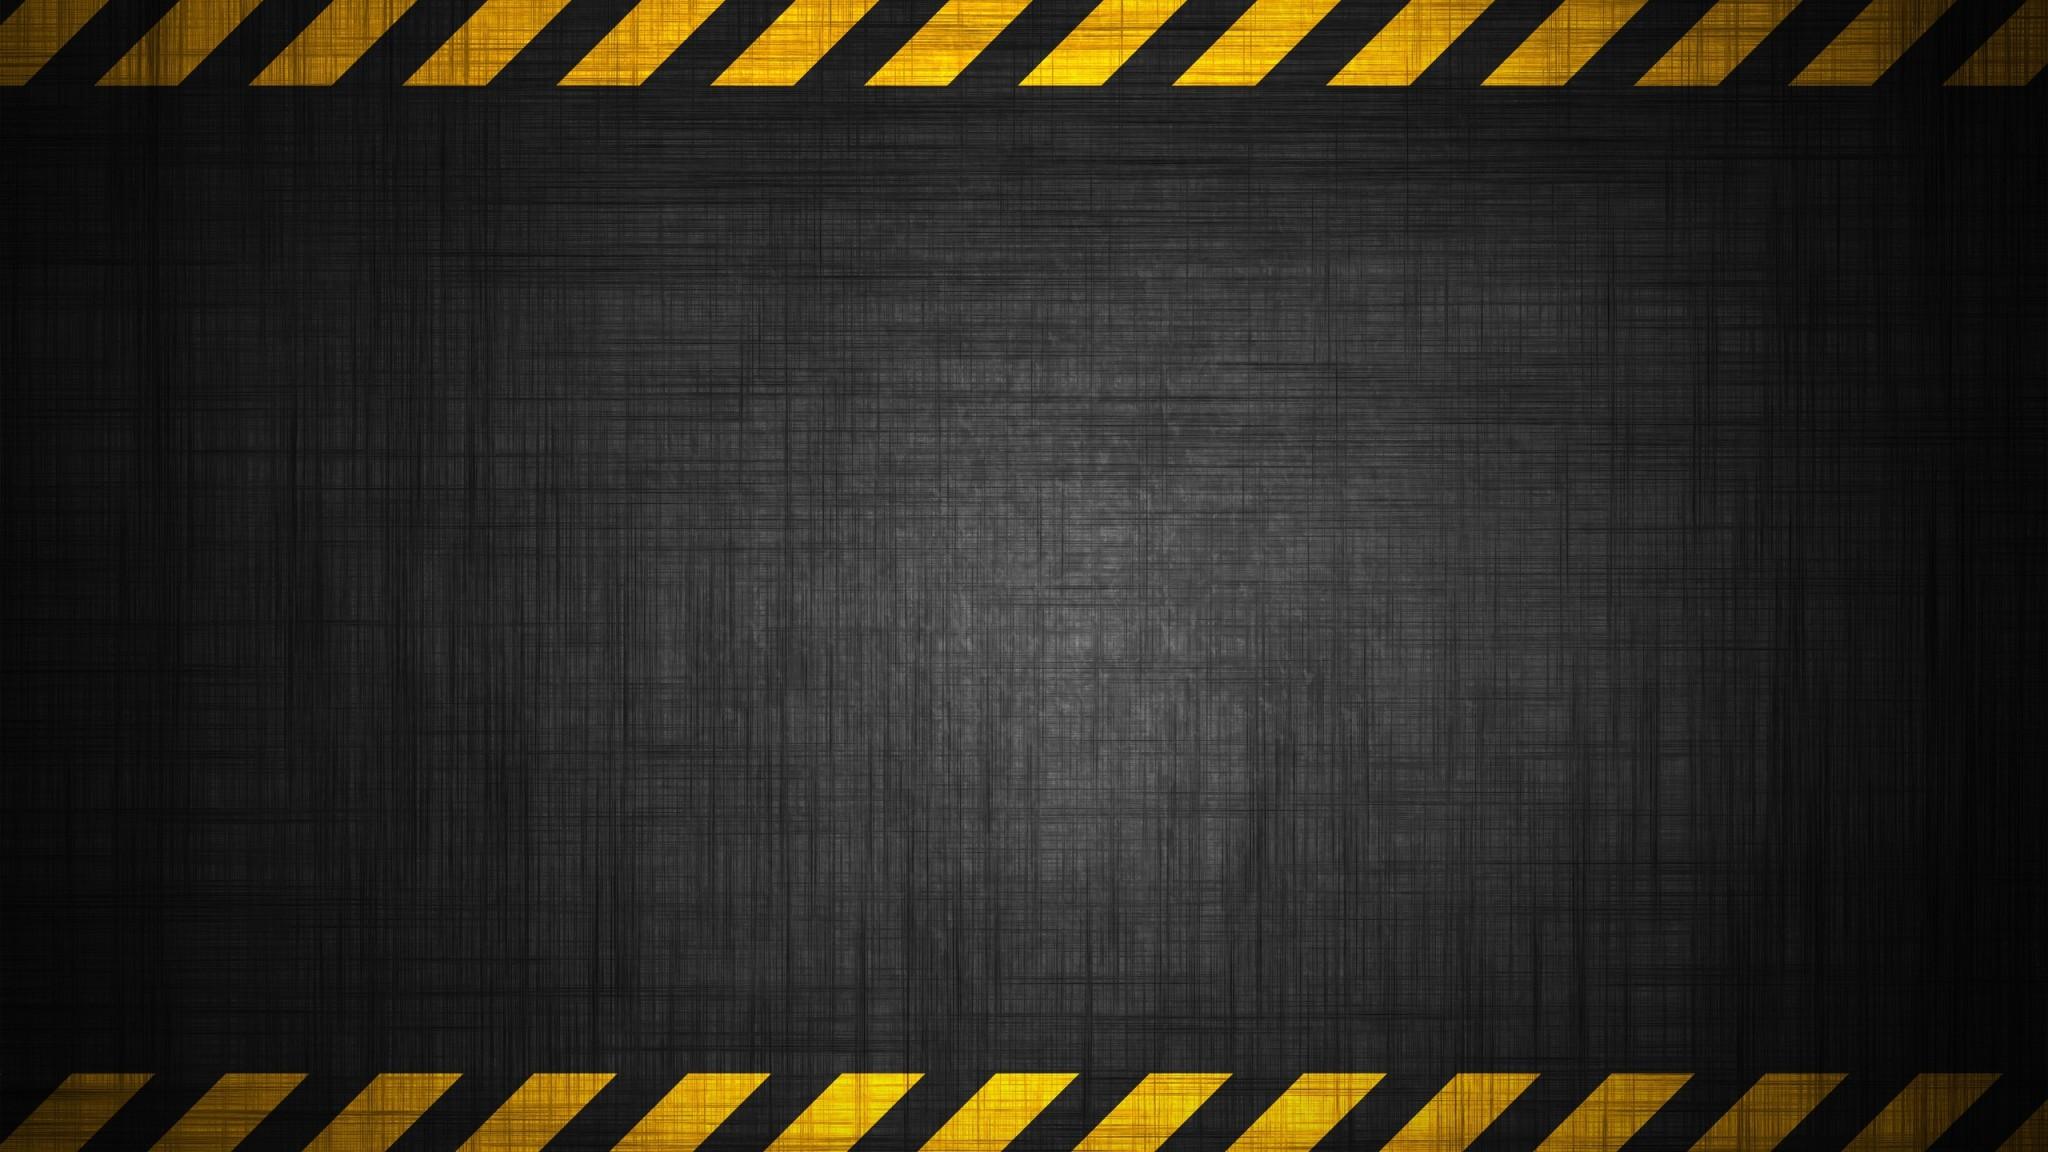 2048x1152 Download Wallpaper Background Tapes Radiation Hazard